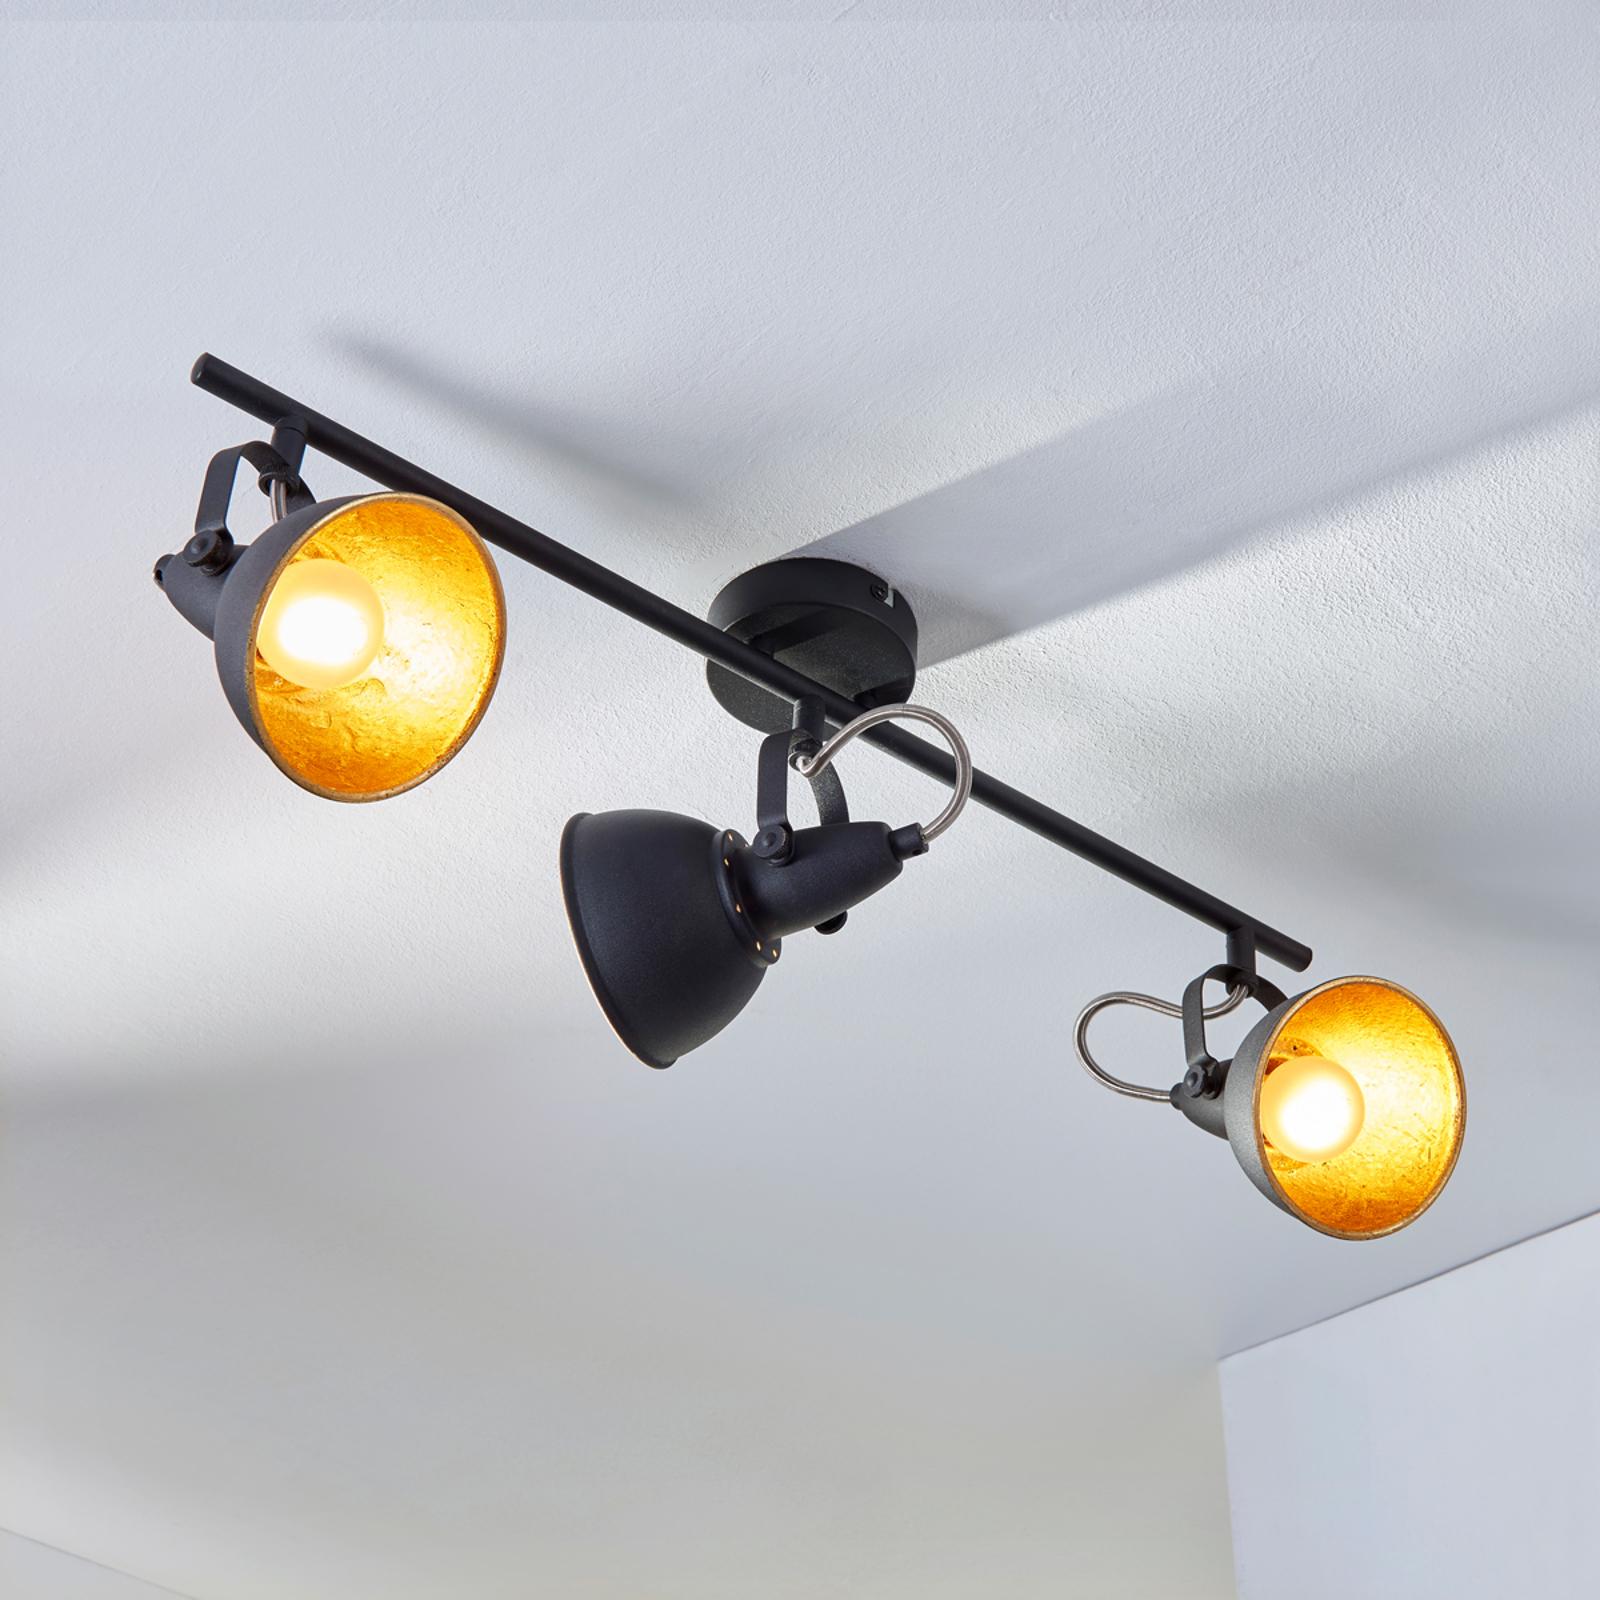 Julin loftlampe med to lyskilder, sort-guld